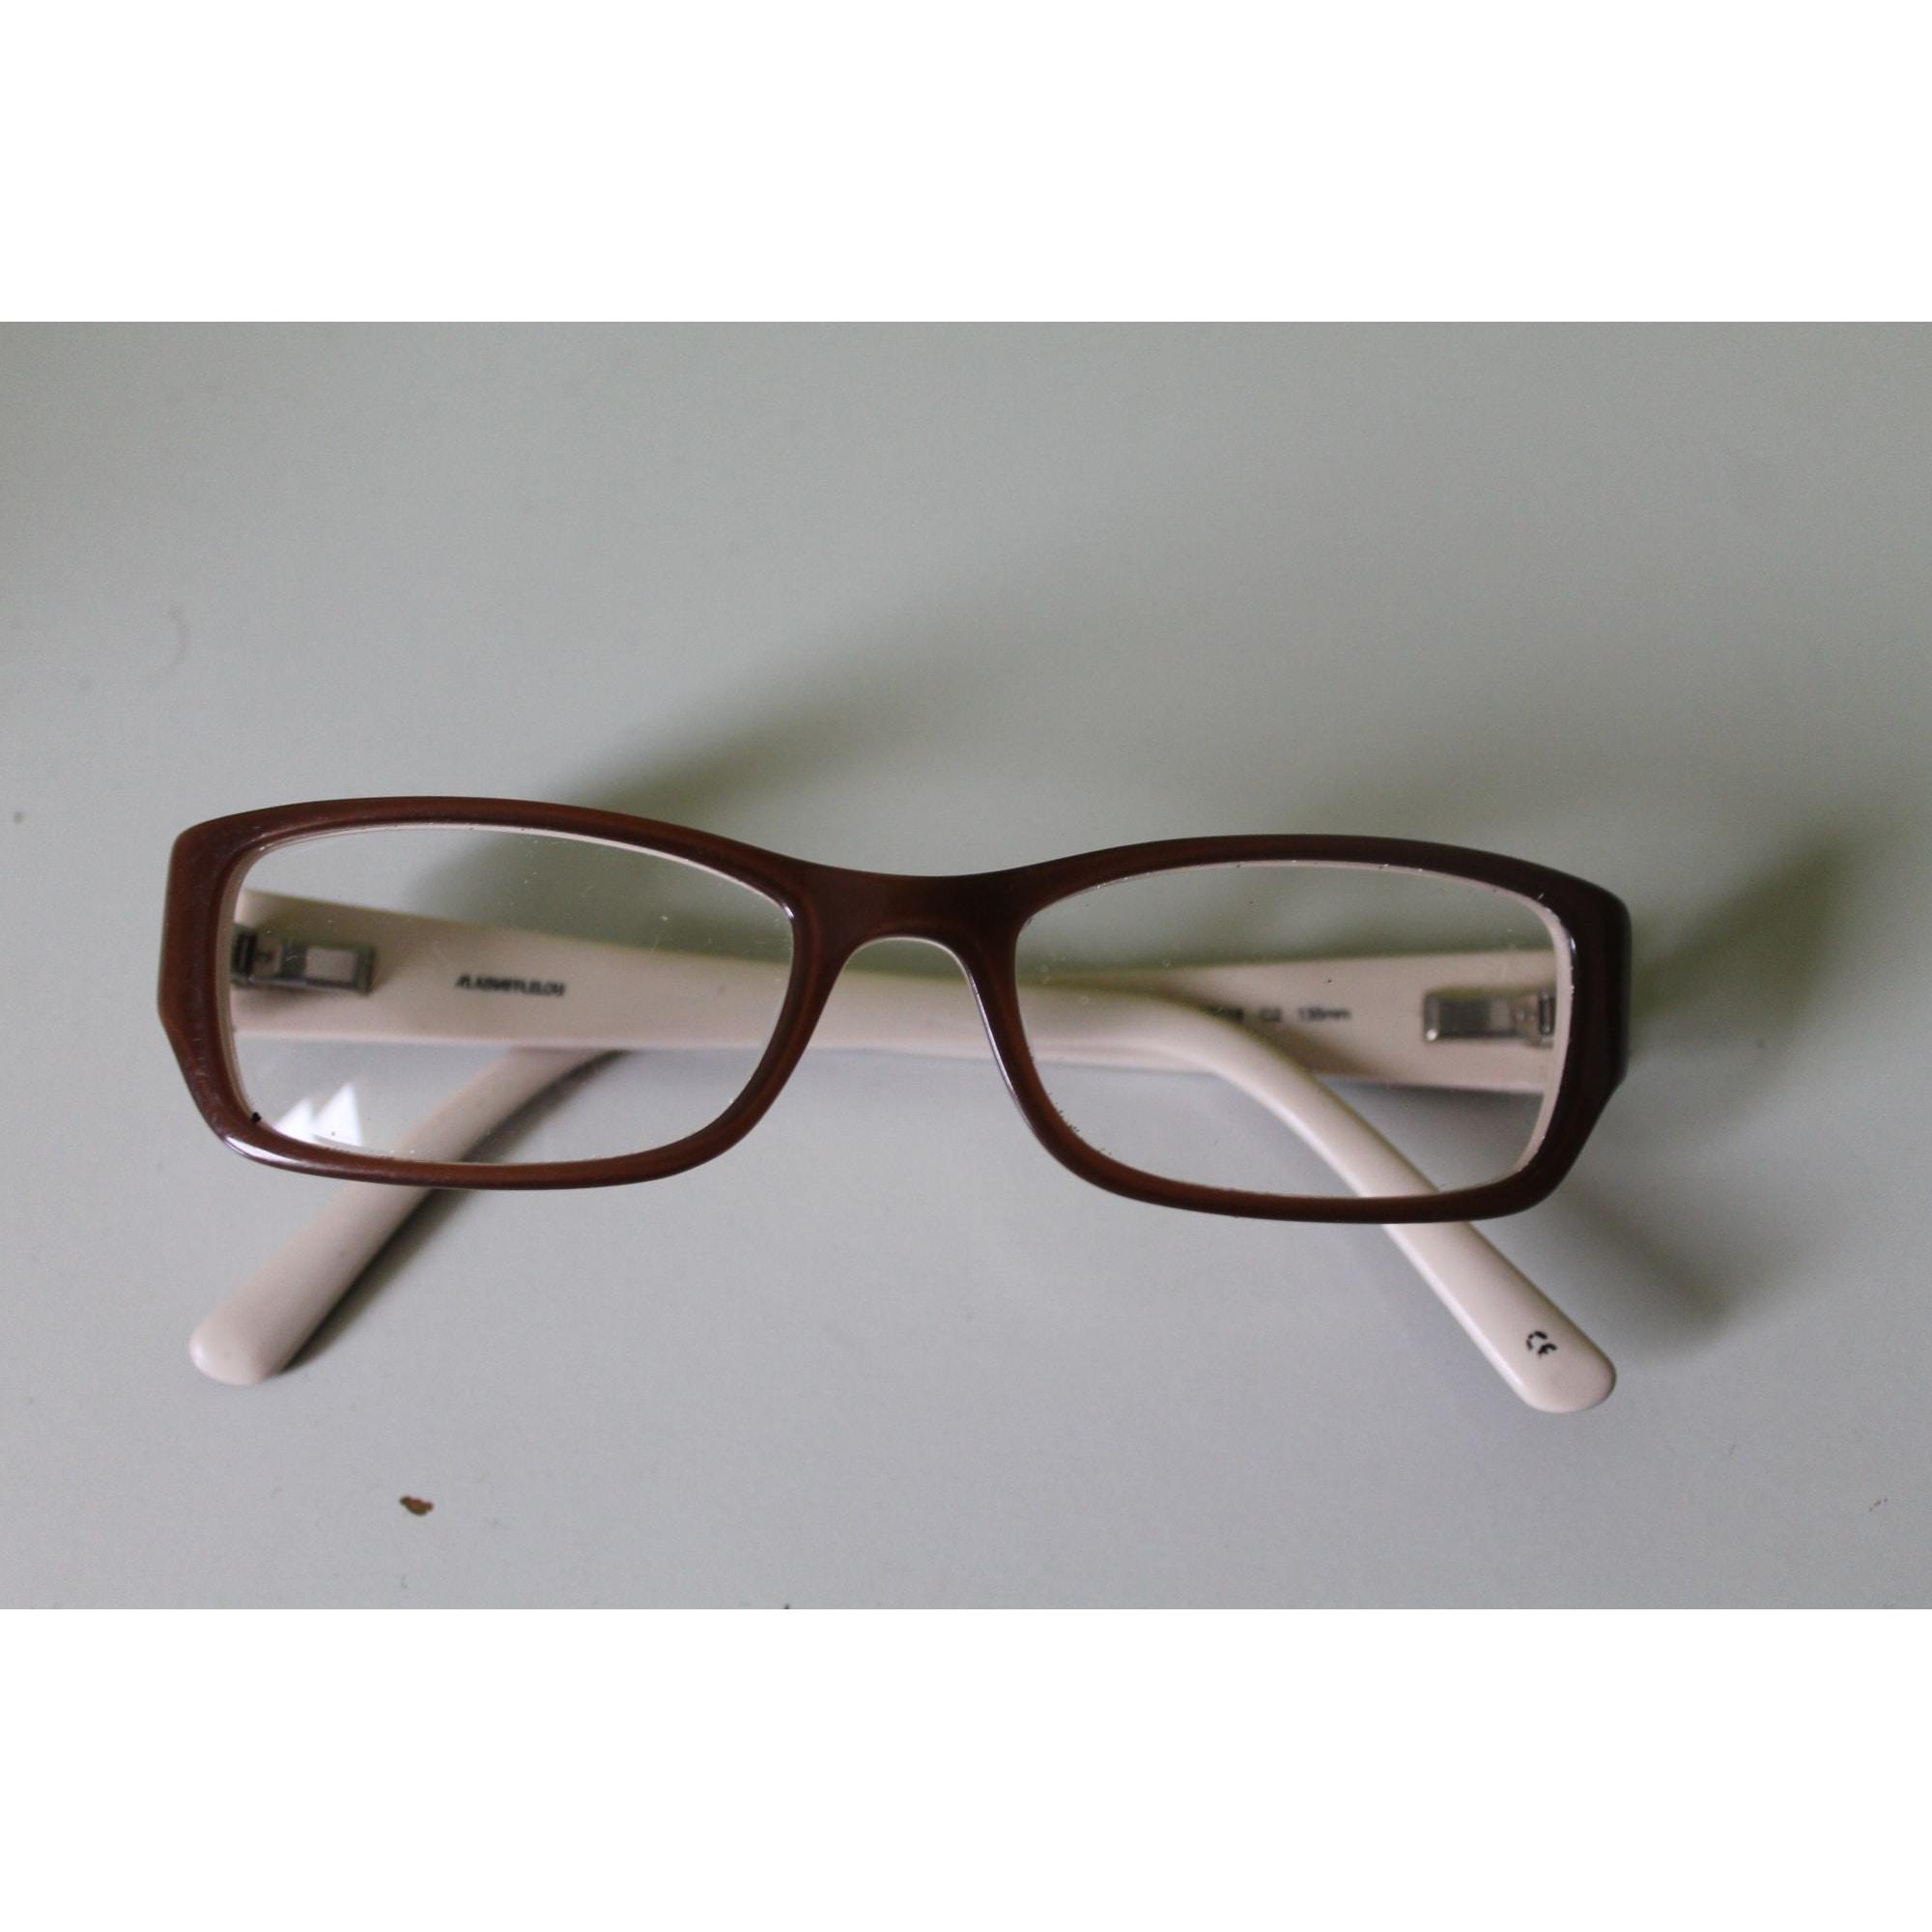 Monture de lunettes ALAIN AFFLELOU Beige, camel